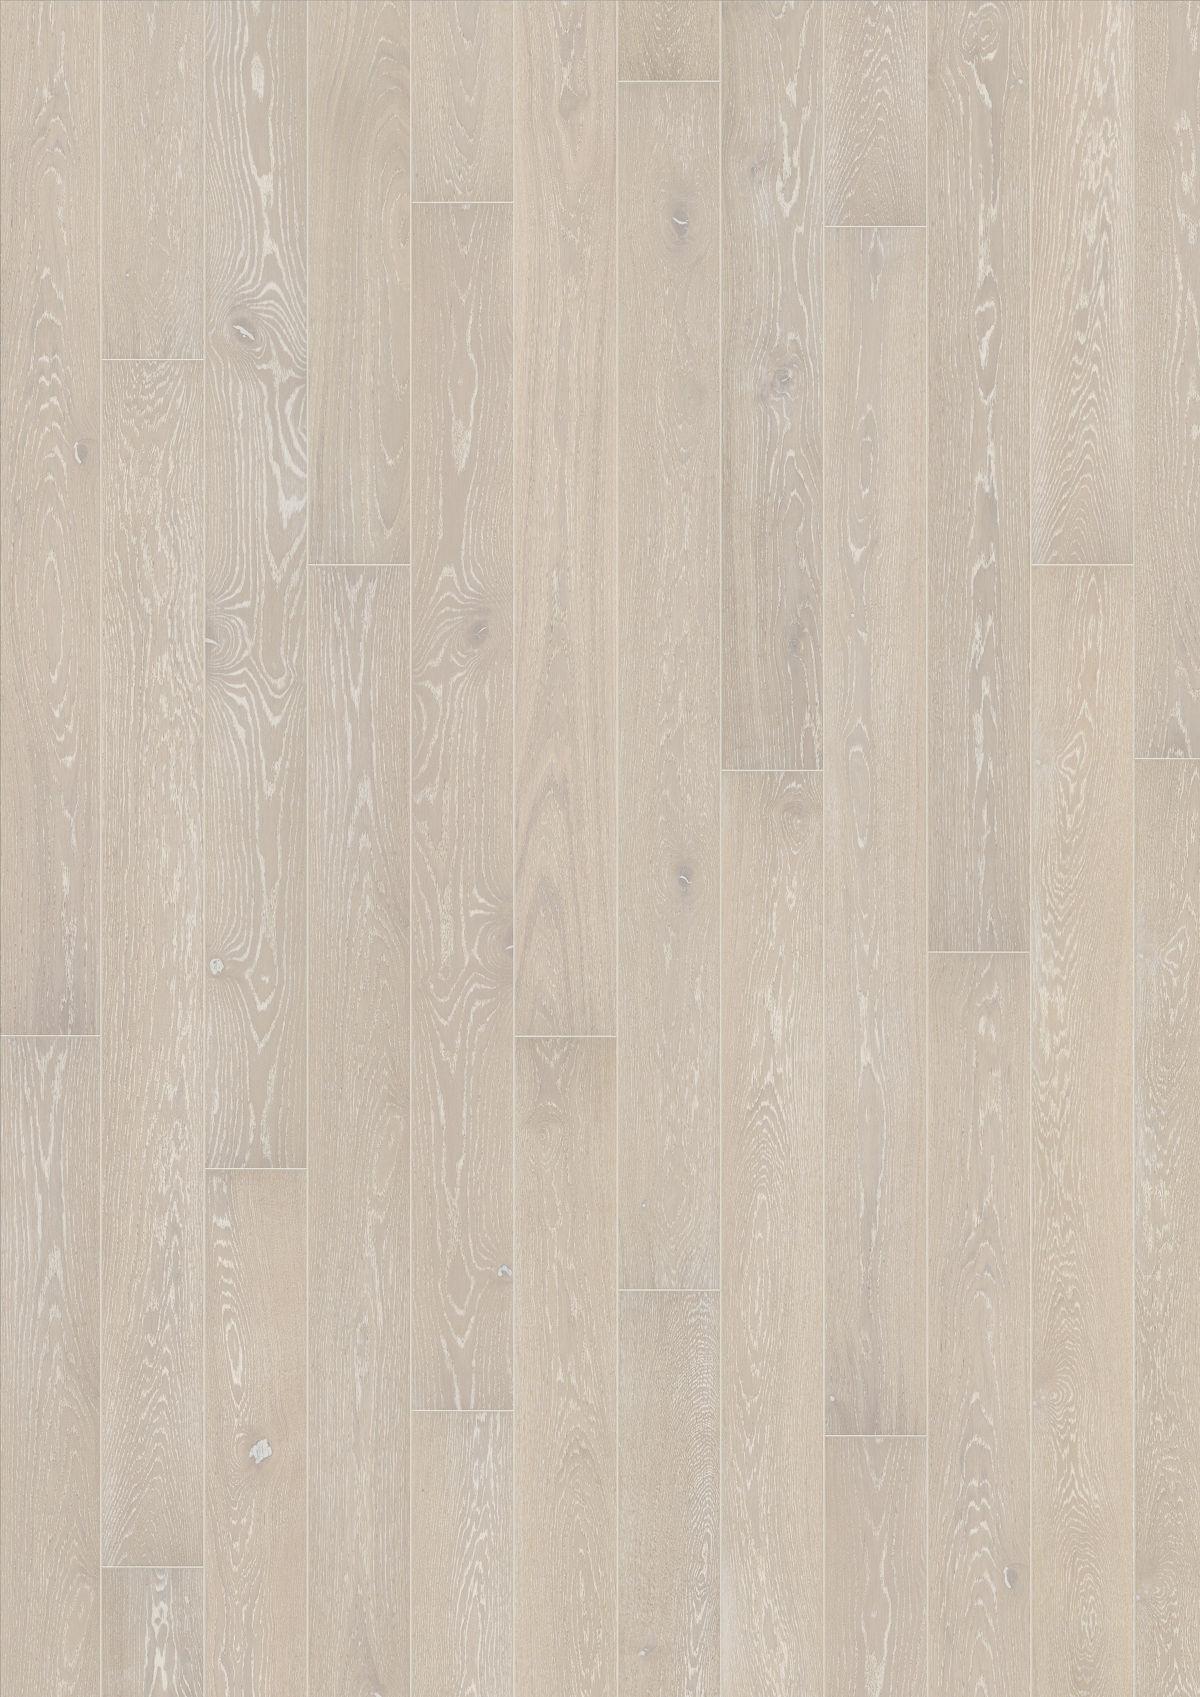 kahrs oak nouveau snow engineered wood flooring. Black Bedroom Furniture Sets. Home Design Ideas